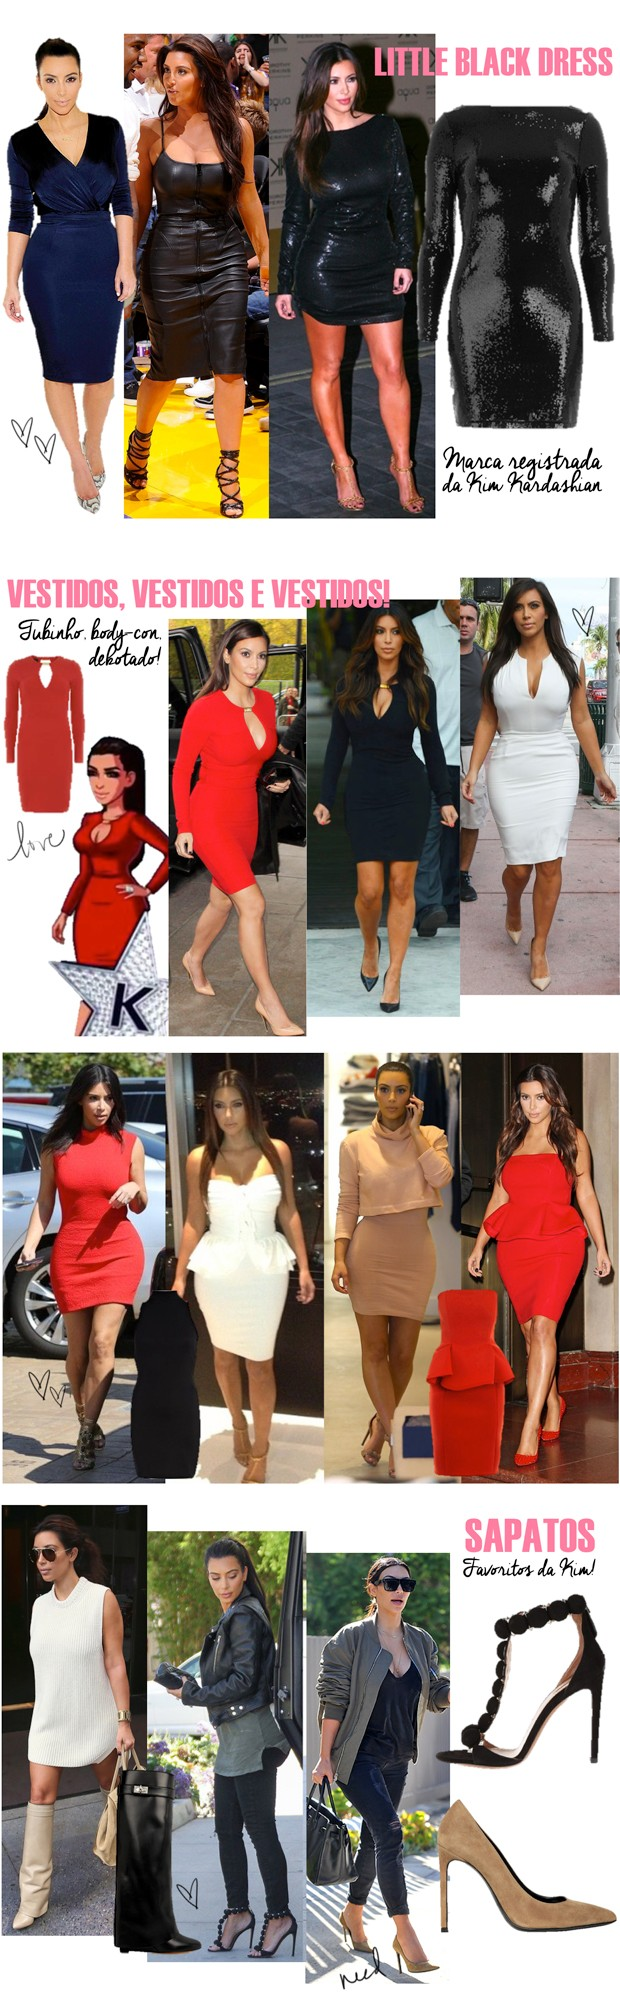 kim-kardashian-cea-3